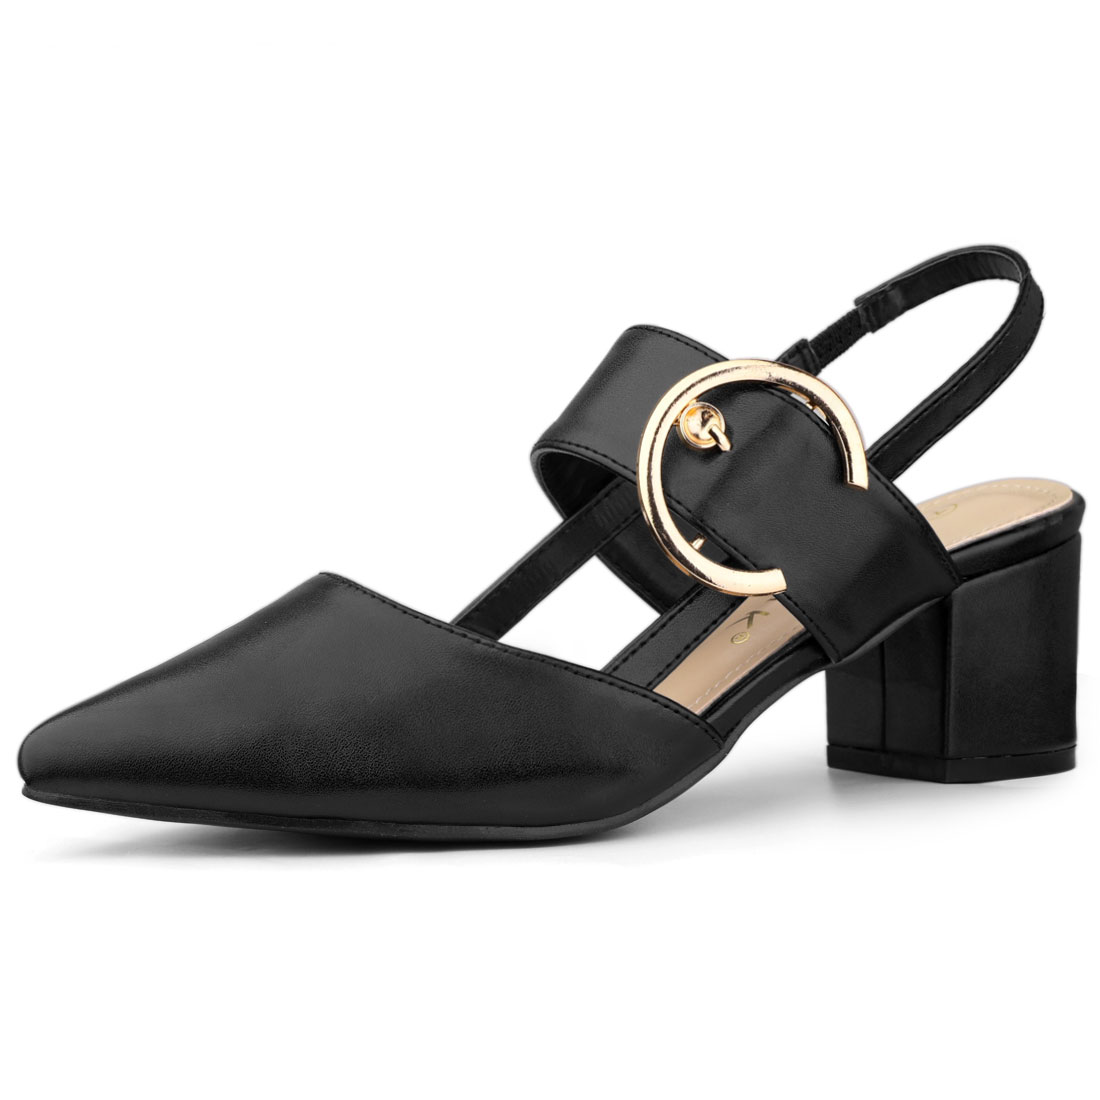 Allegra K Women's Pointed Toe Chunky Heels Mules Pumps Black US 9